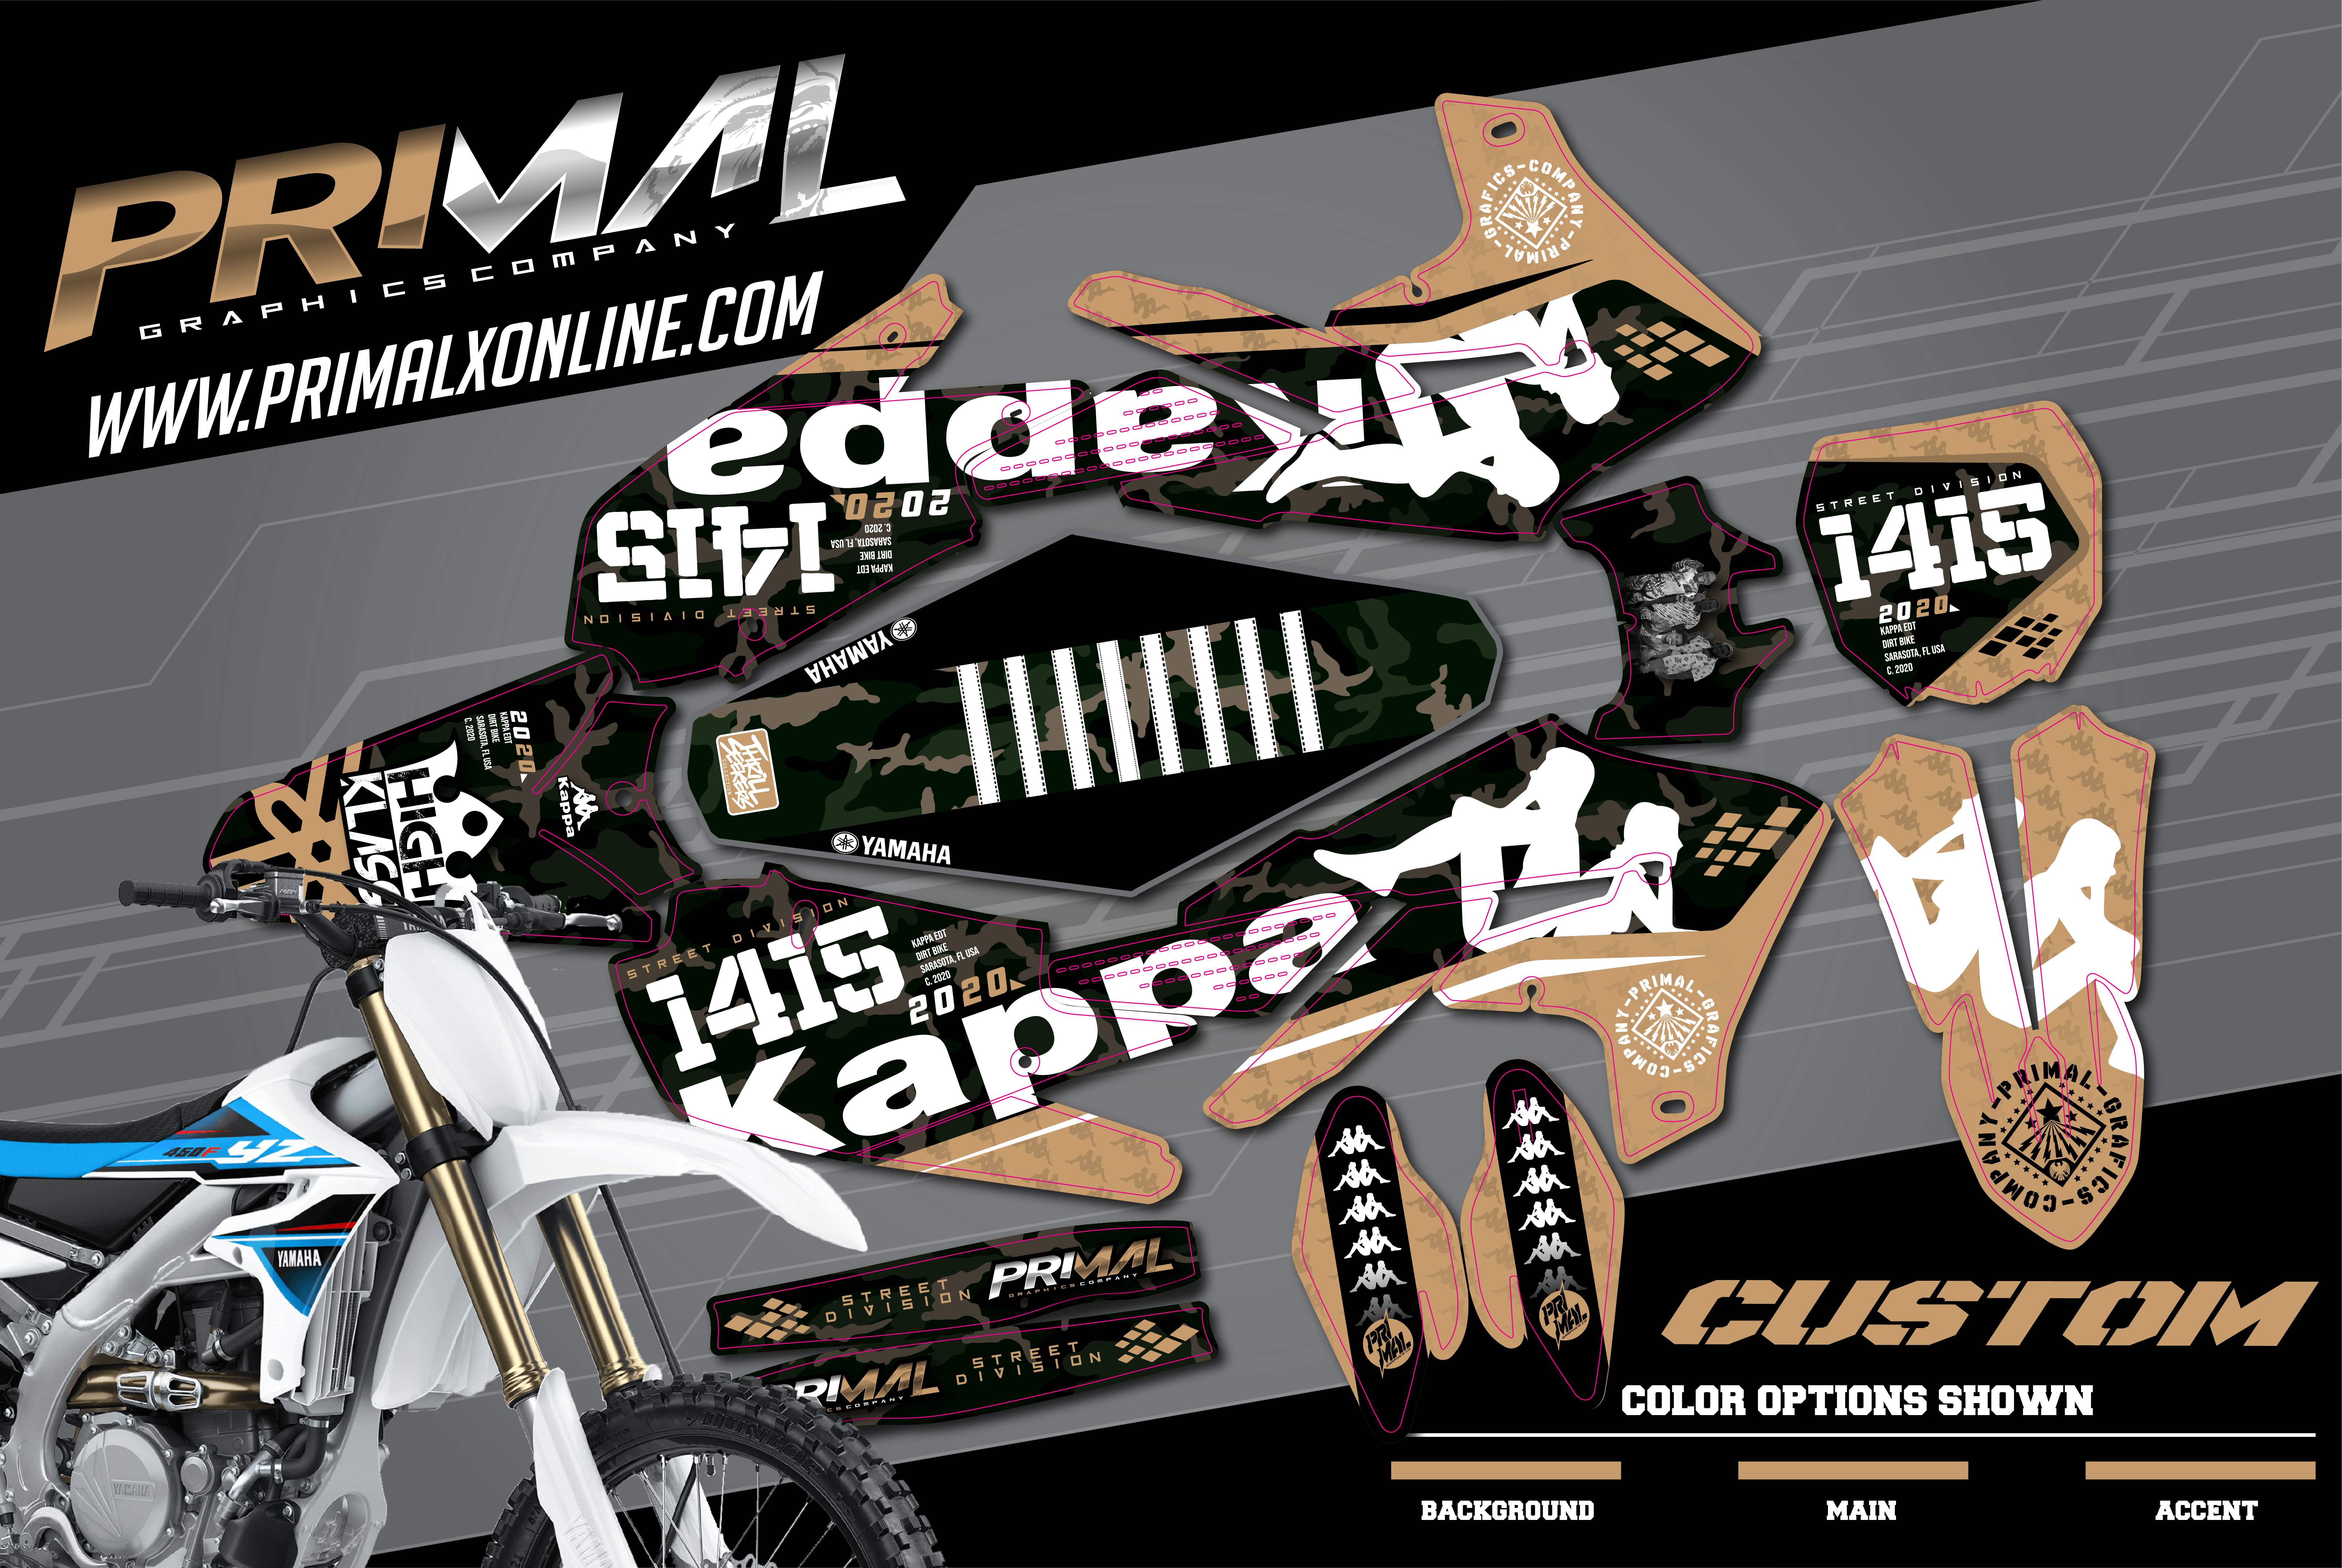 PRIMAL-X-MOTORSPORTS-PRIMAL-GRAPHICS-CO-2020-2021-YAMAHA-YZ250F-YZ450F-MOTOCROSS-GRAPHICS-BIKELIFE-KAPPA-CHARMCITYKINGS-CHARM-CITY-KINGS-BALTIMORE-BIKELIFE-01